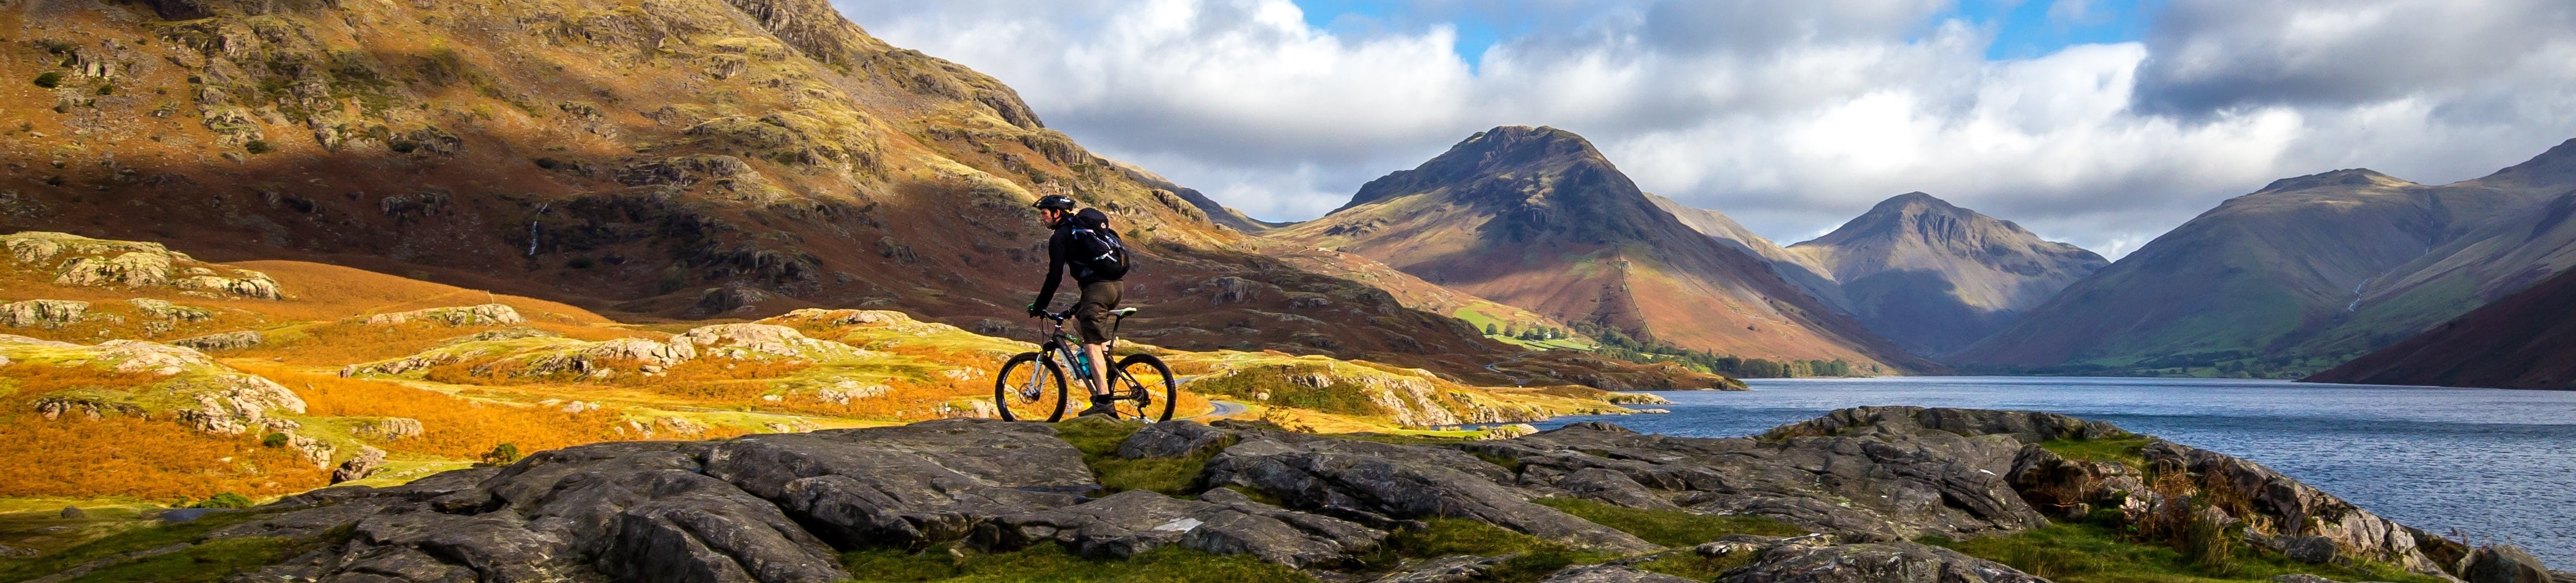 person mountain biking